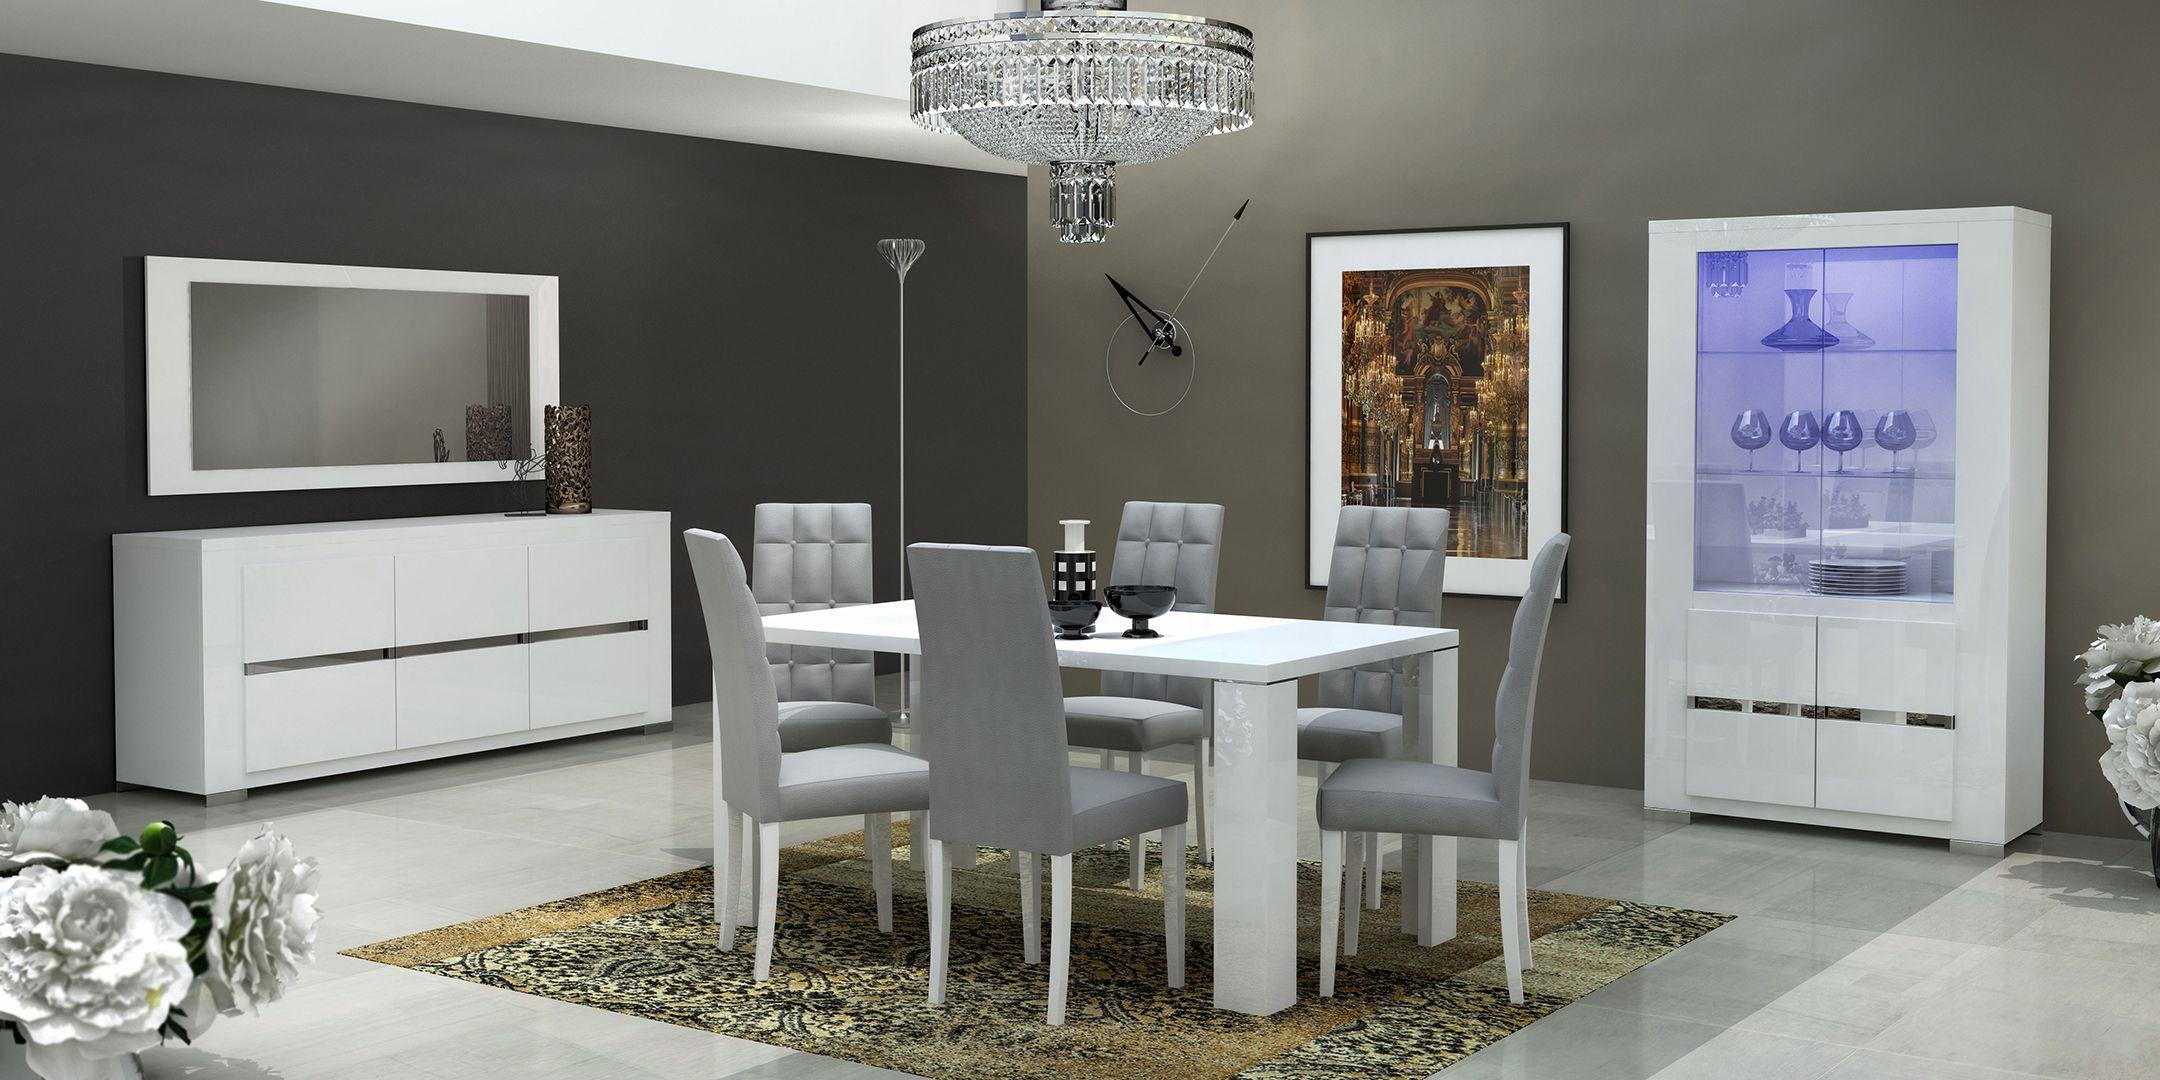 Designer Esszimmer Stuhle Stuhle Pinterest Dining Room Dining